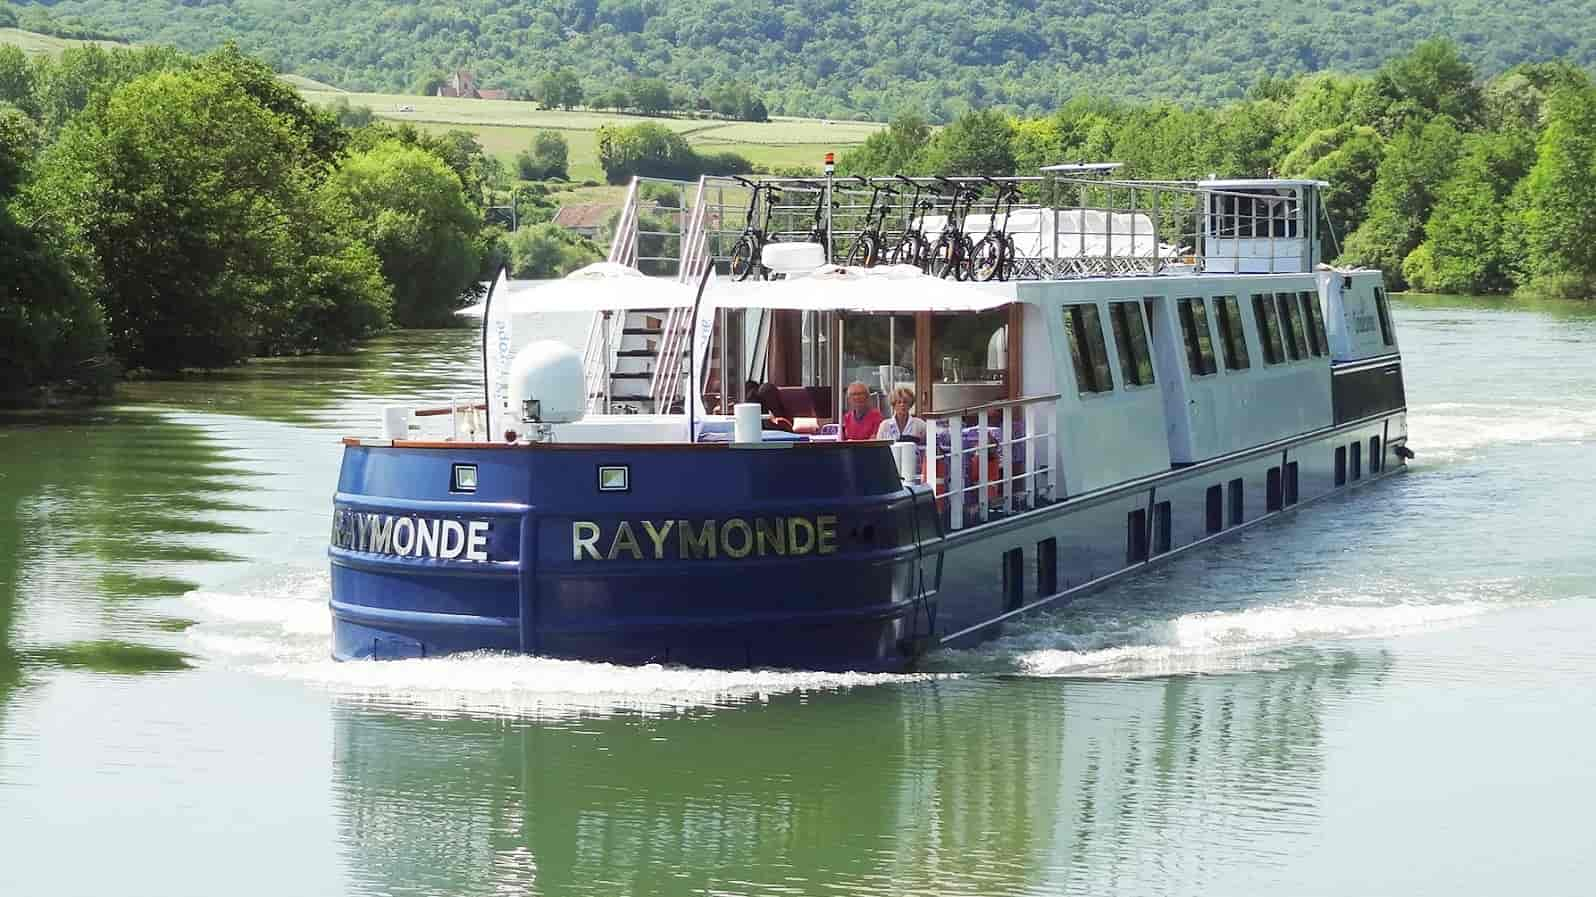 Barge-Raymonde-ulkokuva-©CroisiEurope.jpg